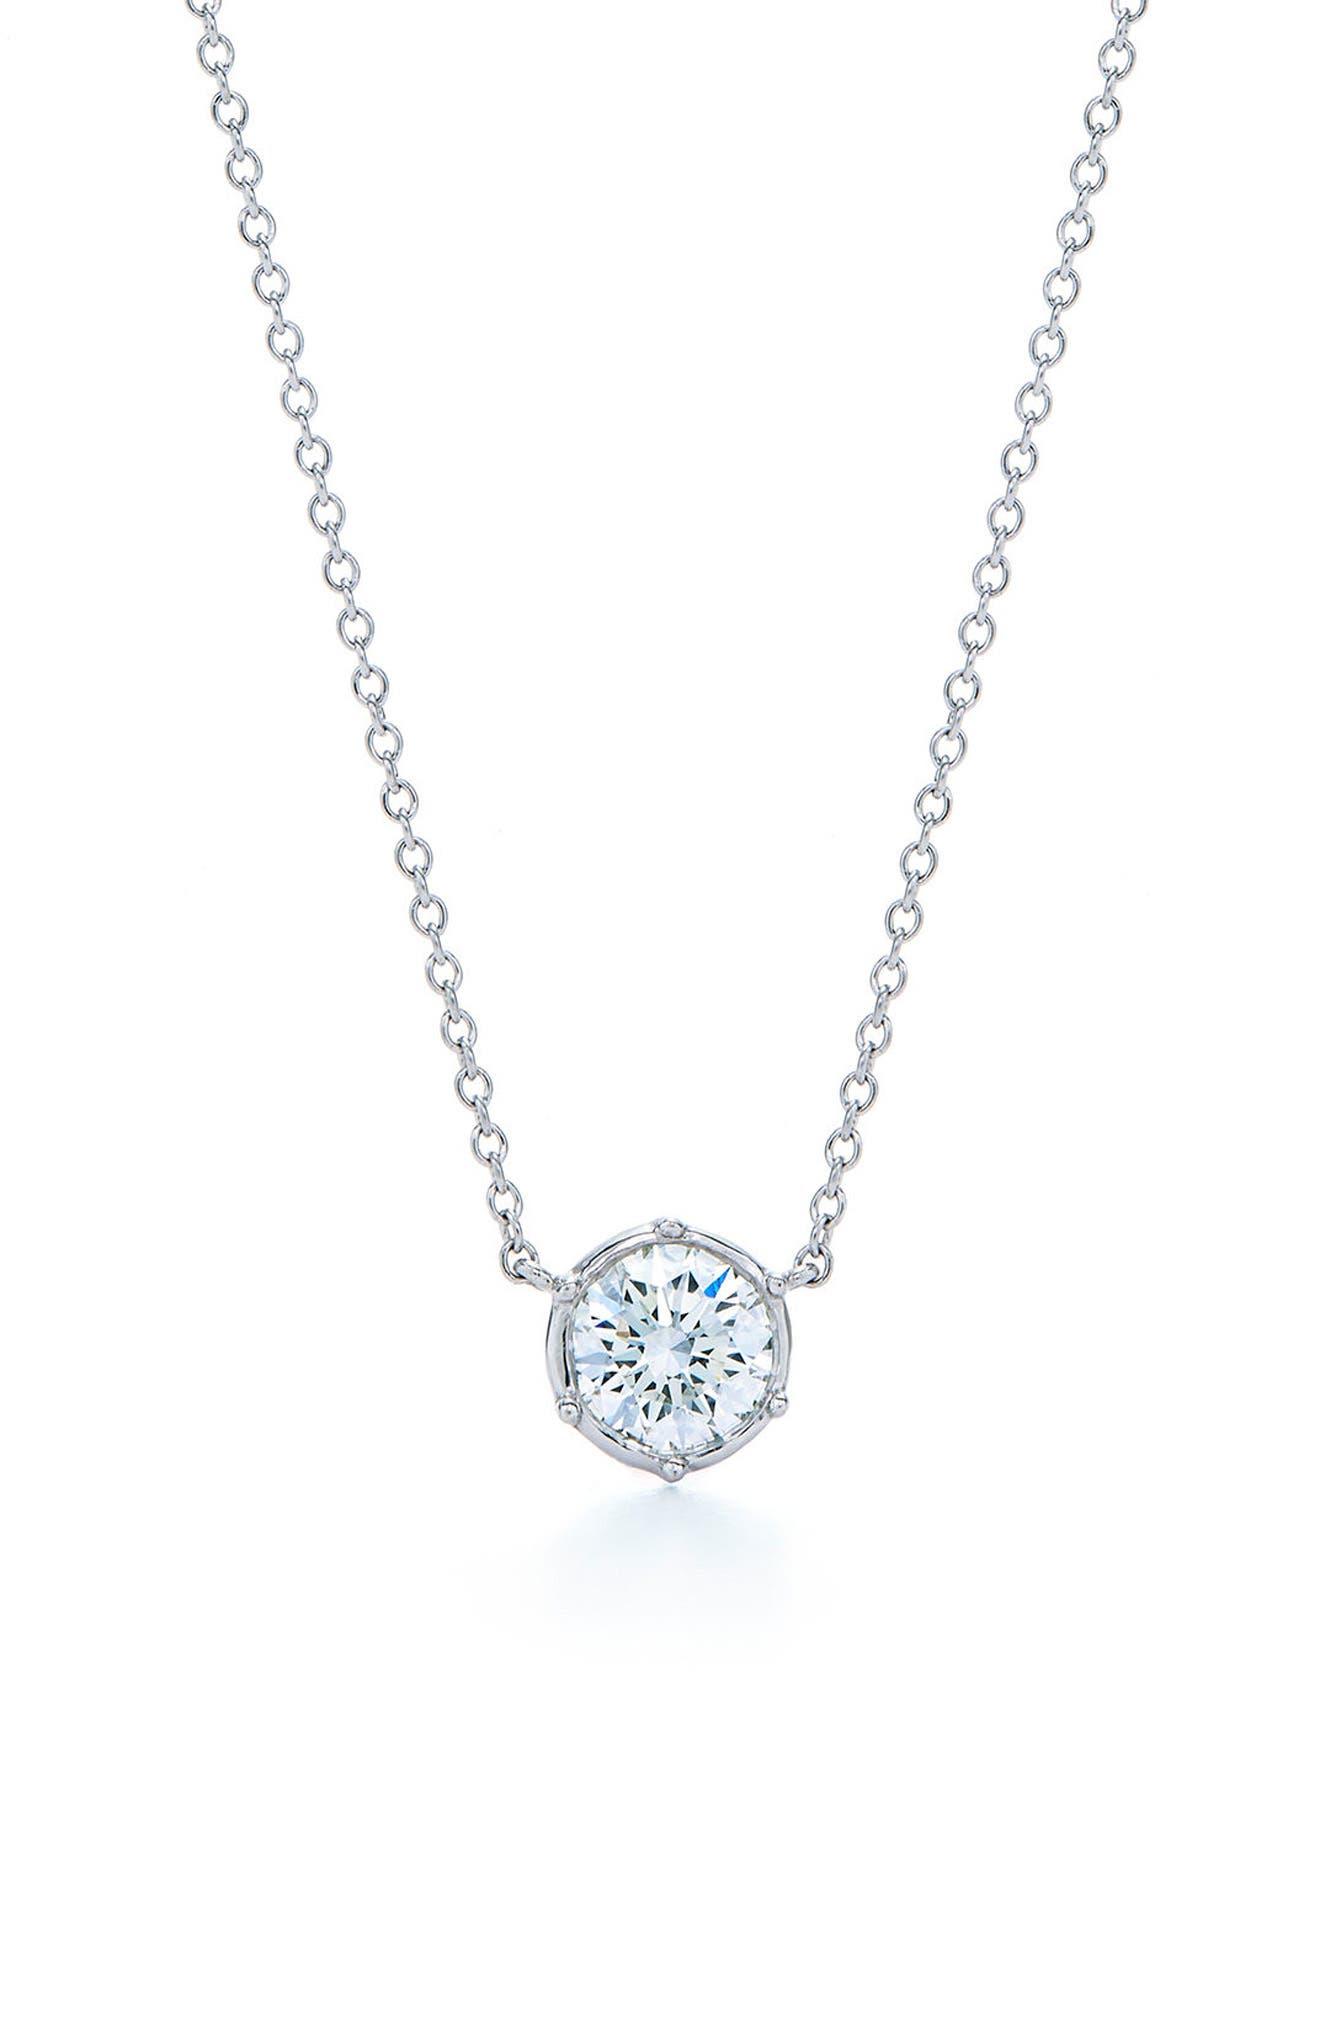 Main Image - Kwiat Classic Diamond Bezel Pendant Necklace